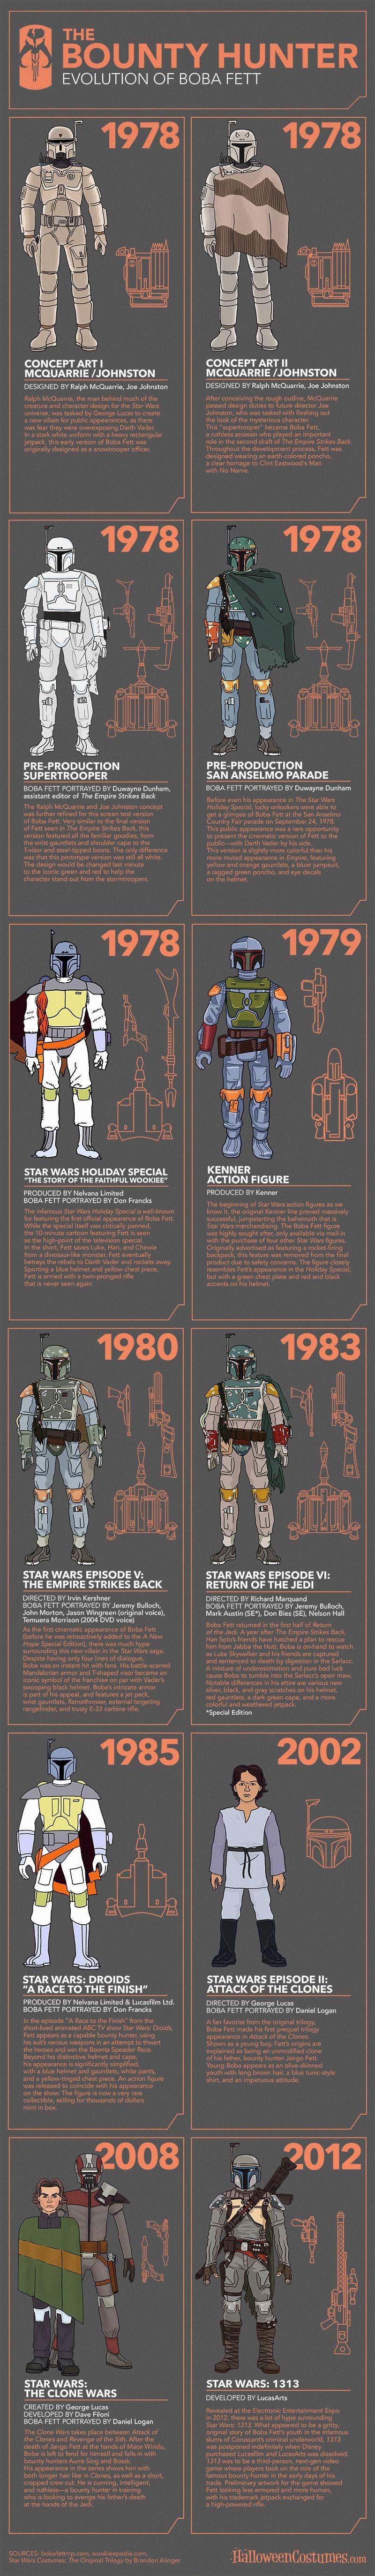 star-wars-infographic-shows-the-evolution-of-boba-fett